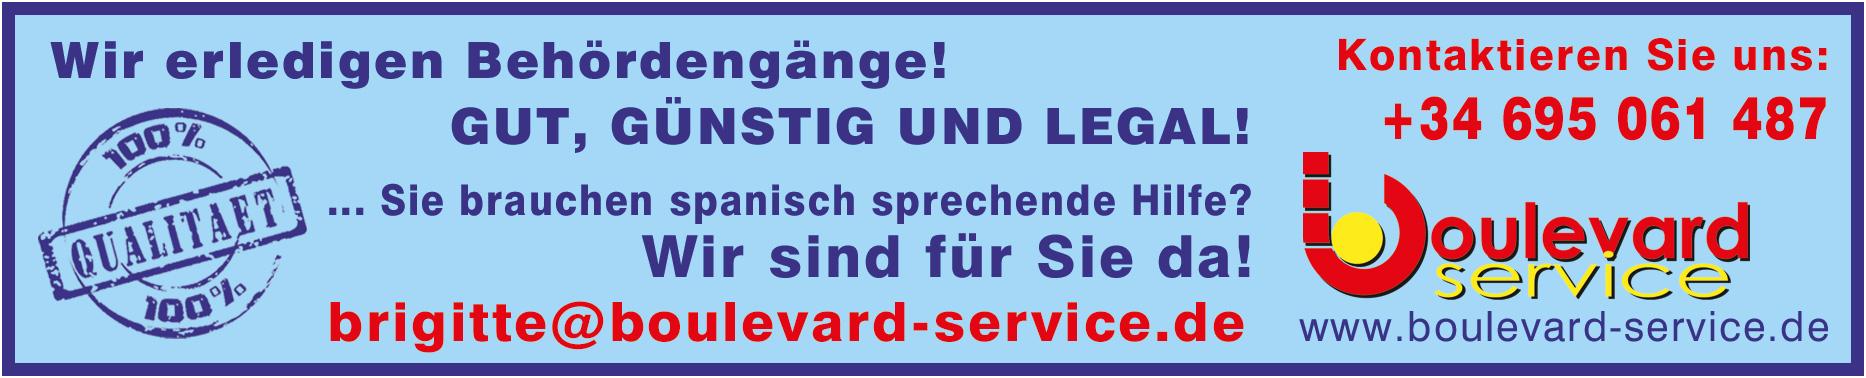 BVD-Service